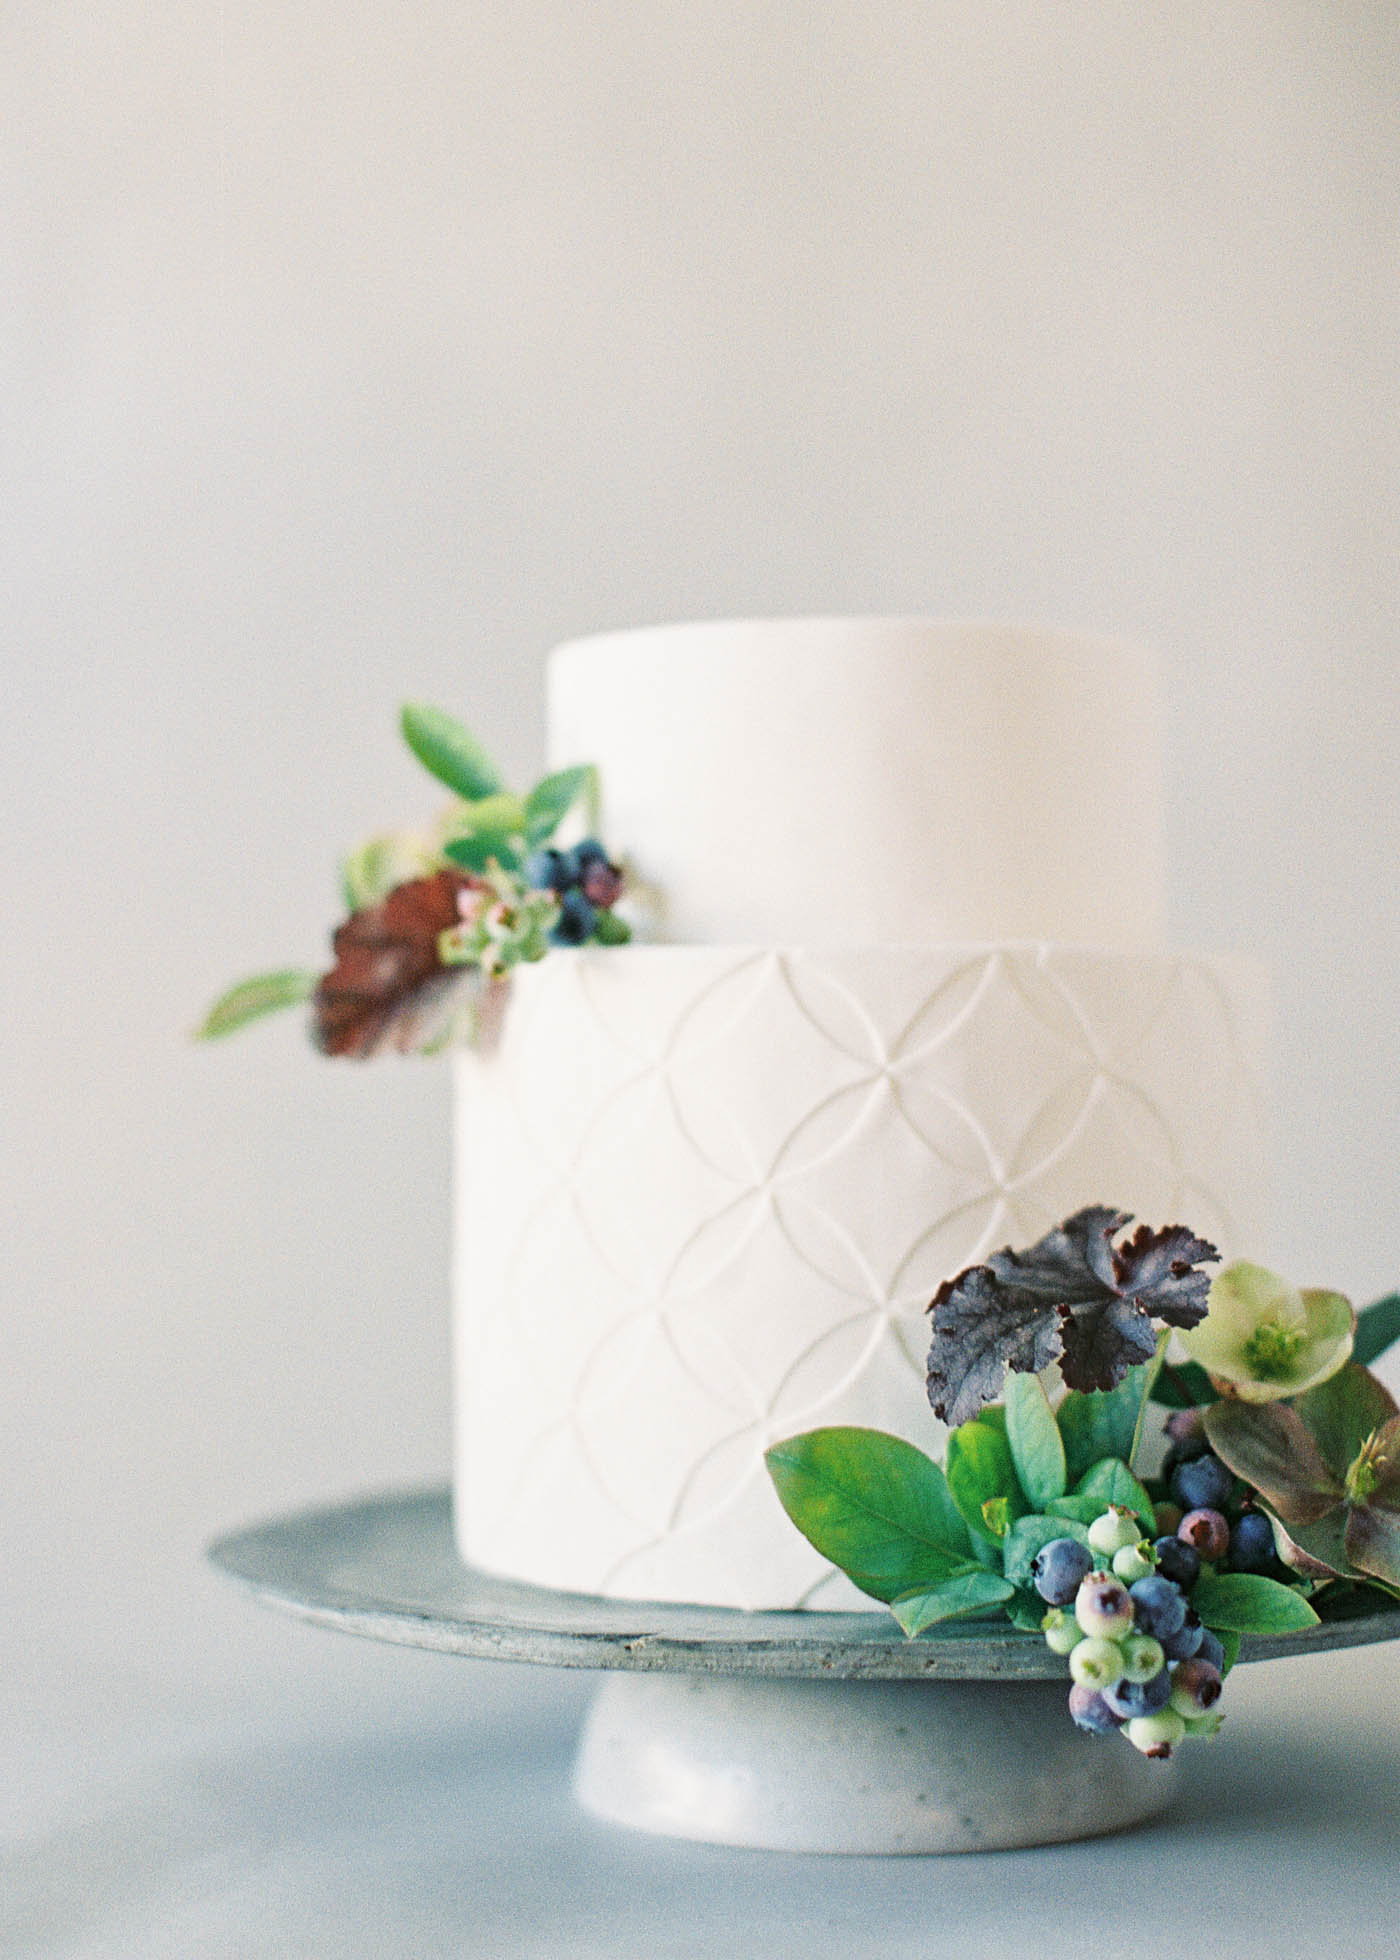 naturalist-cakes-3-Jen_Huang-000486-R1-011-4.jpg